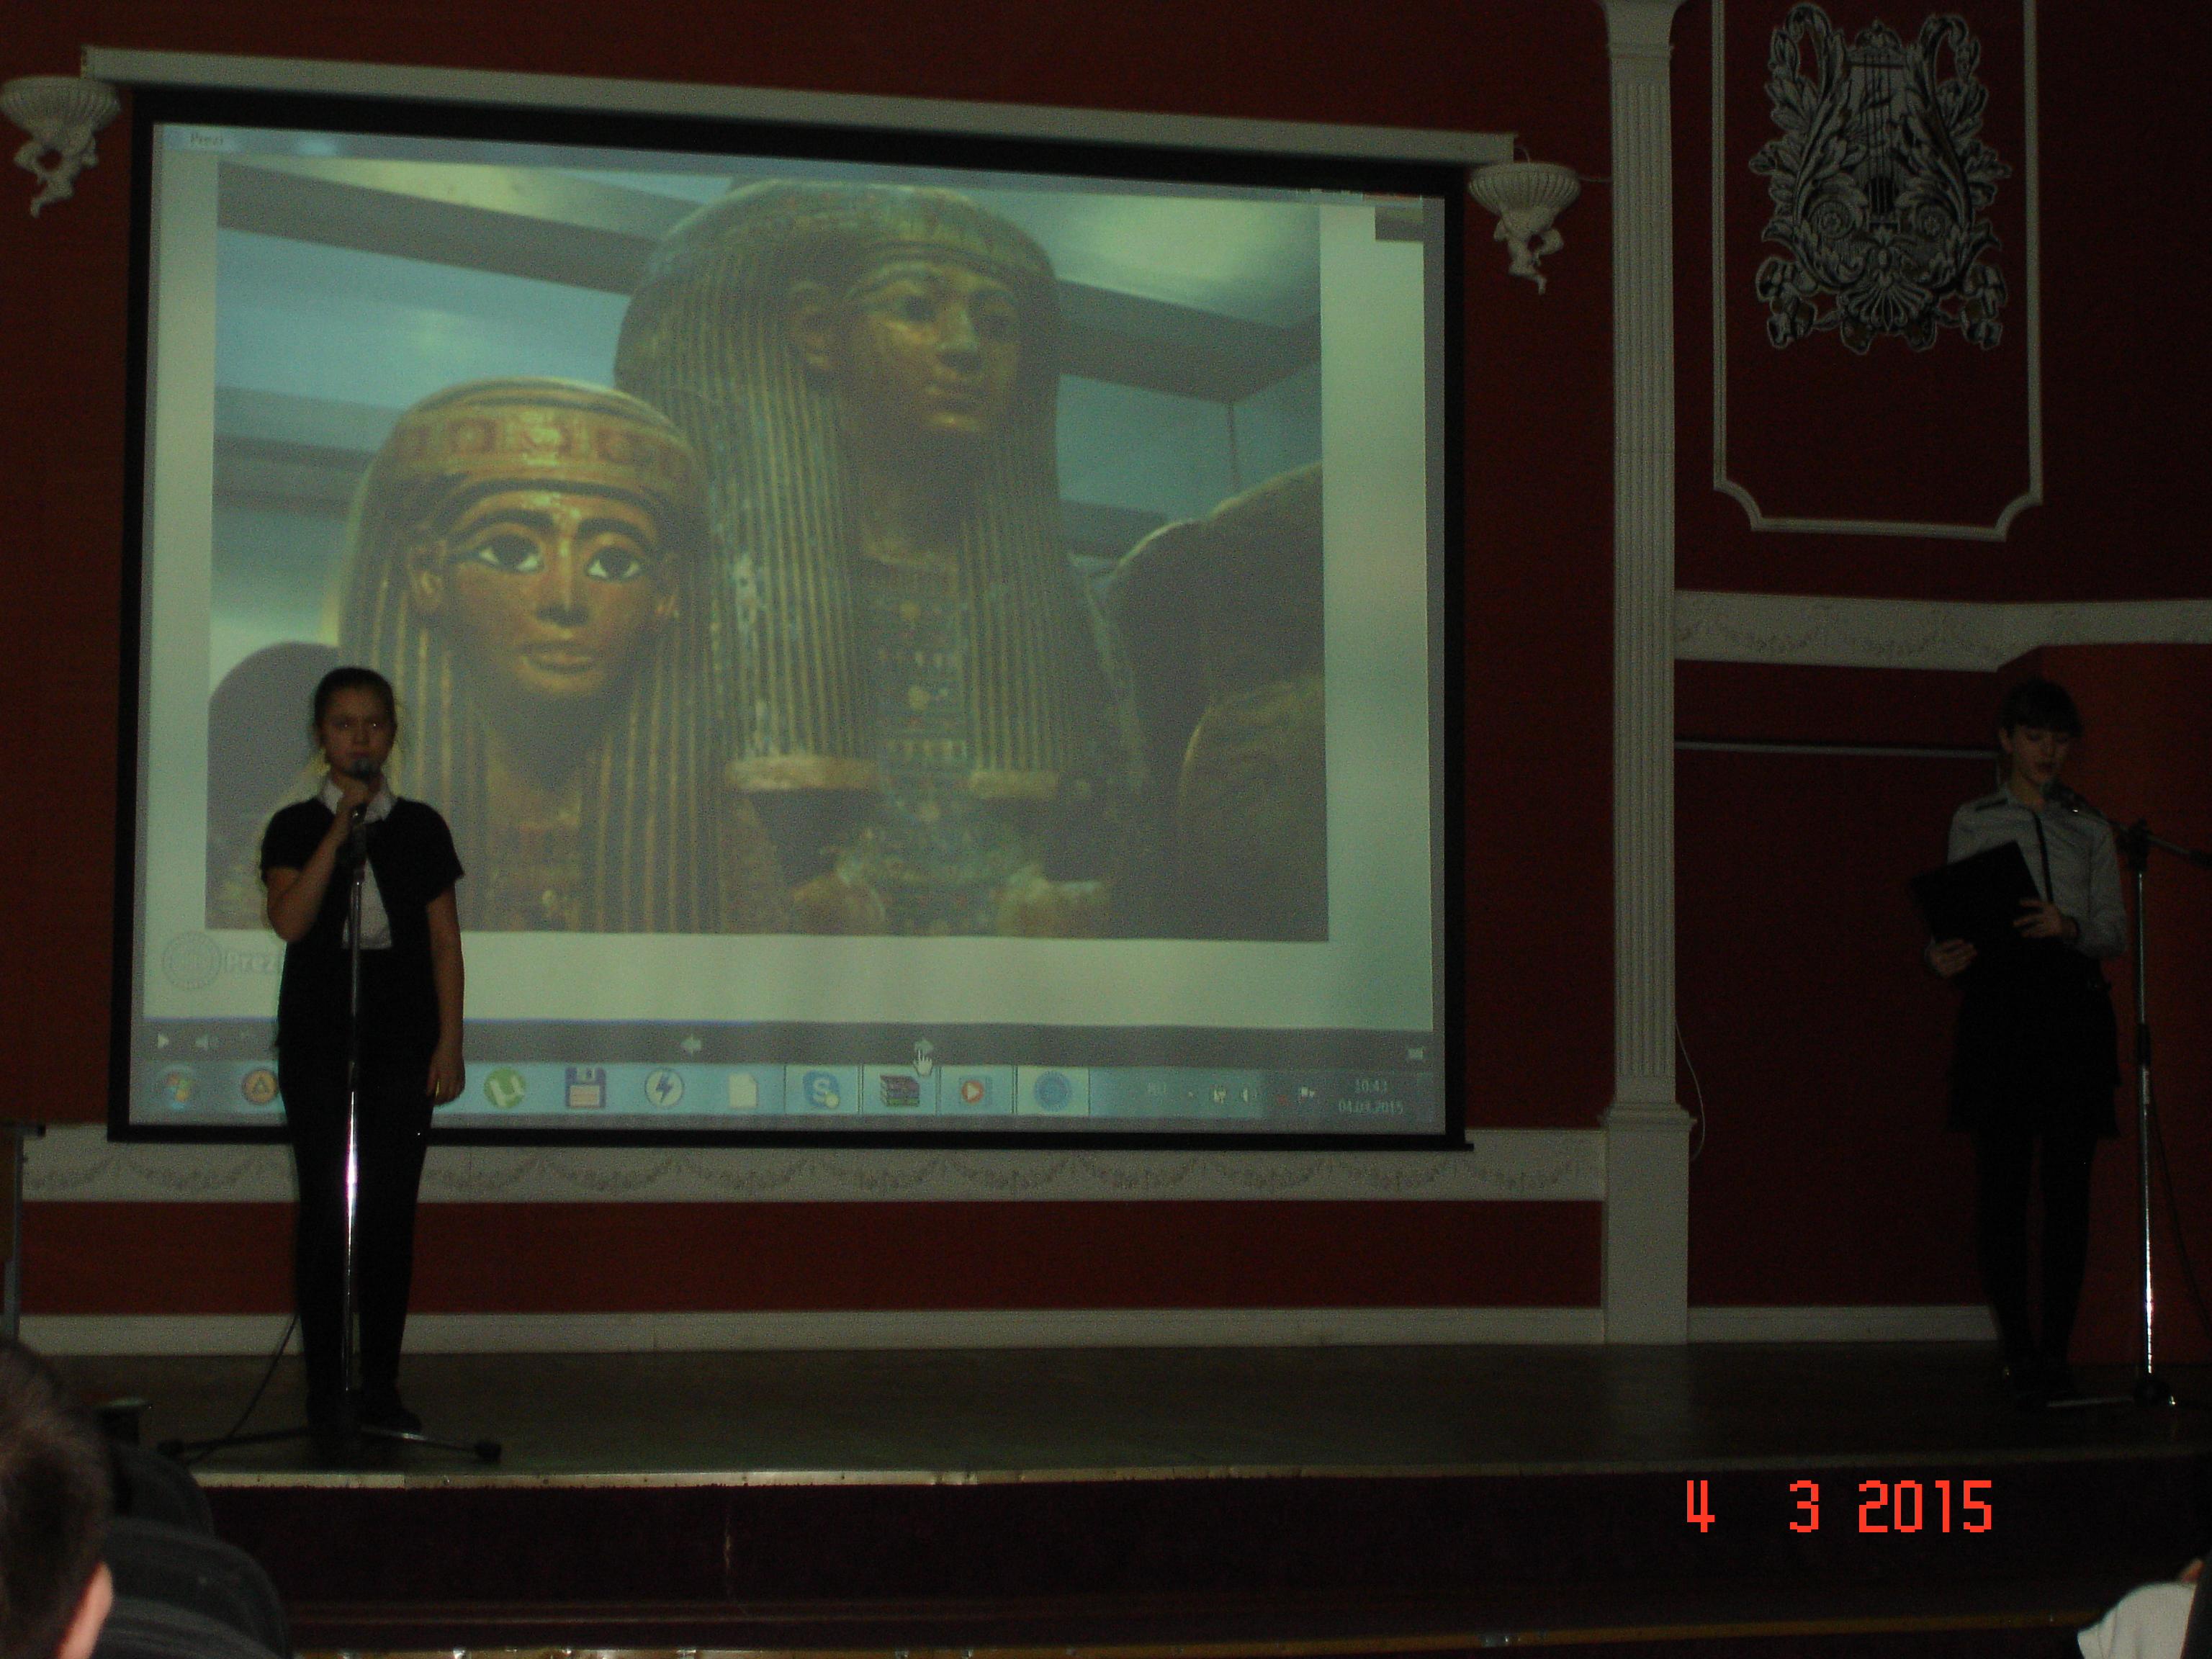 D:\Лилия\ПК\уч год 14-15\мероприятие МУзеи Лондона\DSC02496.JPG